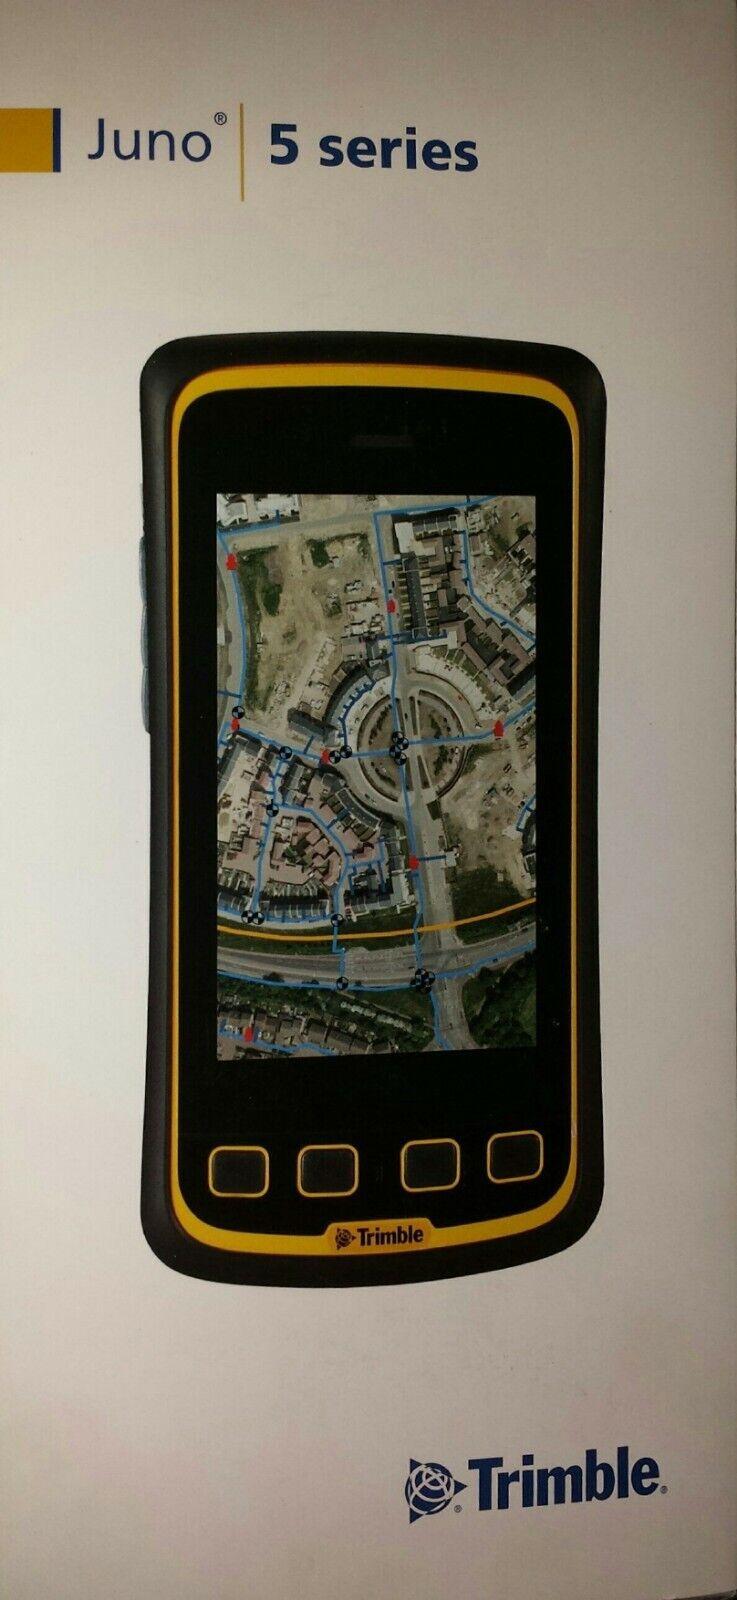 Trimble Juno 5D Handheld Data Collector w/ 3.75 G phone capabilities New